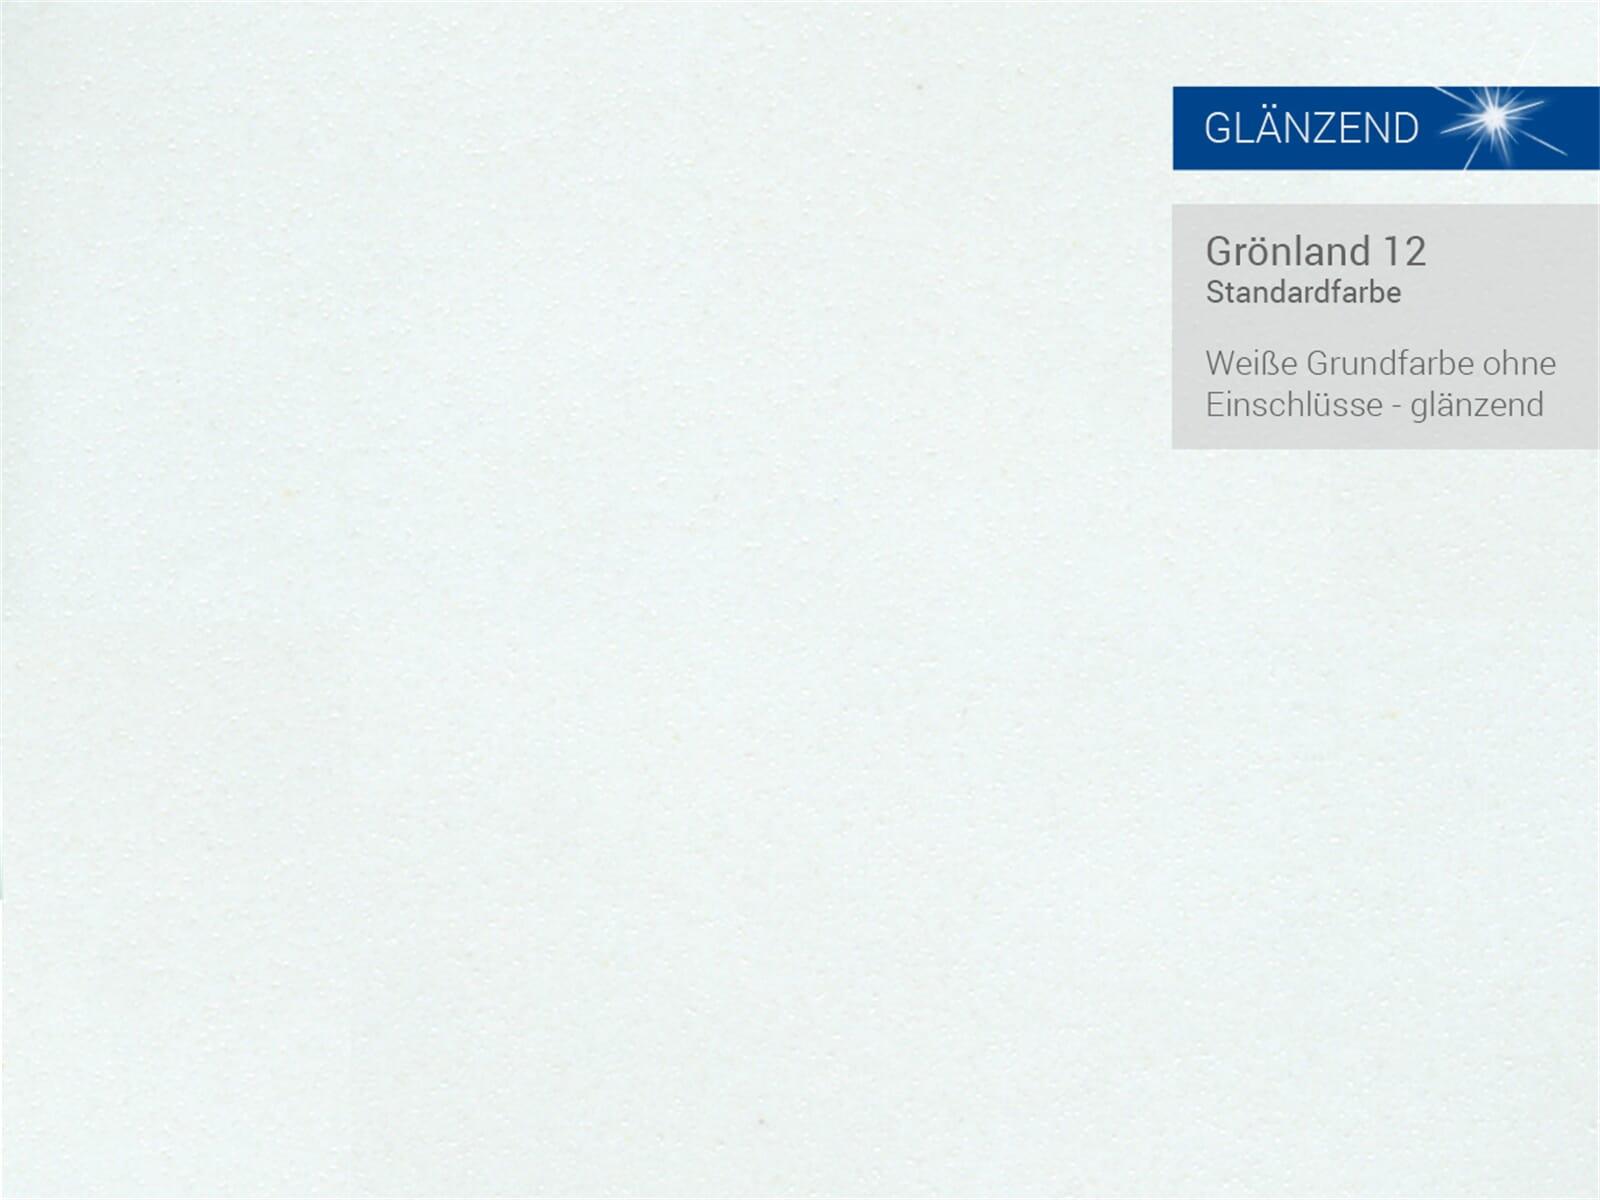 Systemceram Bela 100 Grönland Keramikspüle Excenterbetätigung